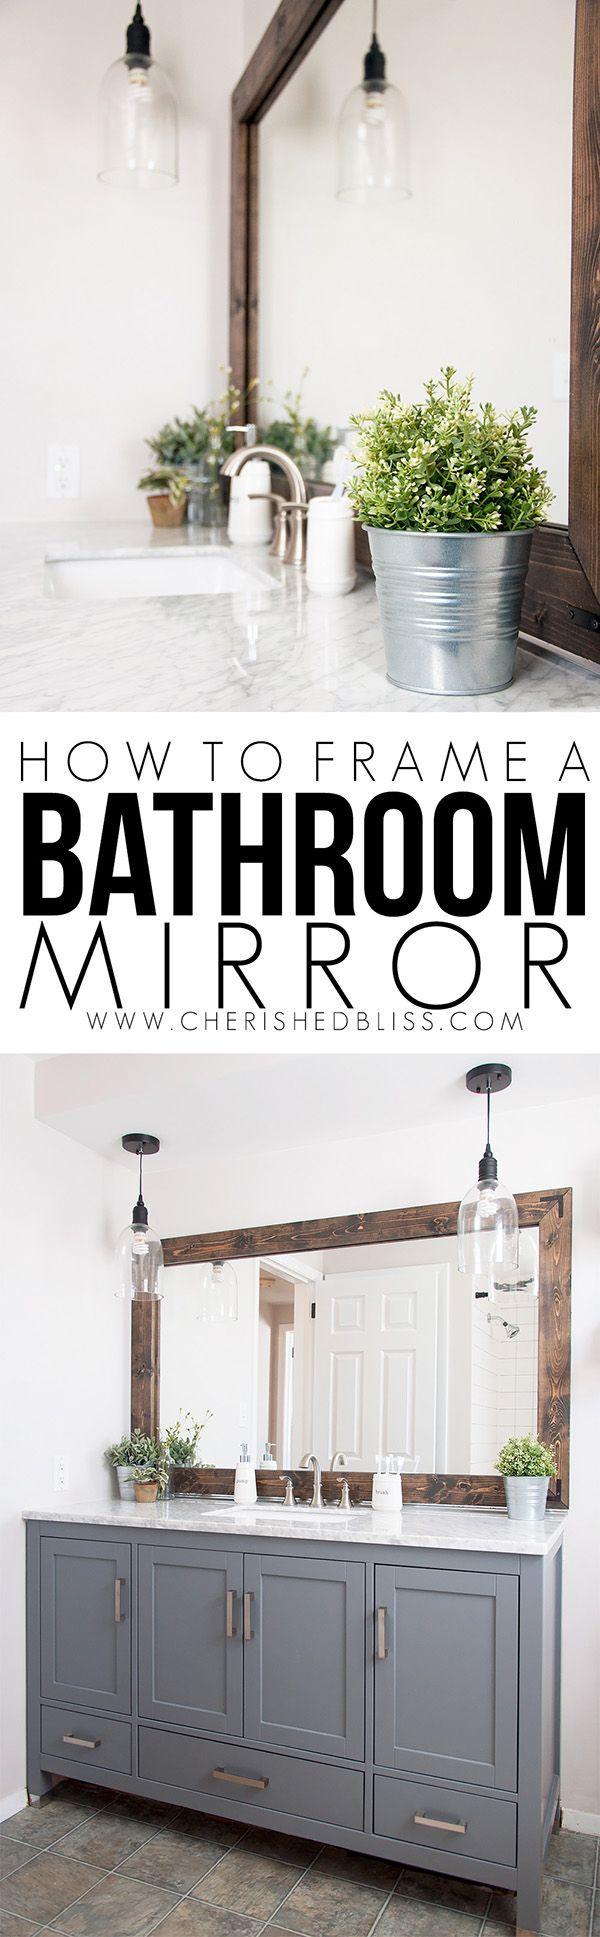 Wonderful Whatu0027s New In The World Of Farmhouse Home Decor DIY And More   Page 7 Of  12. Bathroom Mirror FramesFramed MirrorsBath ...